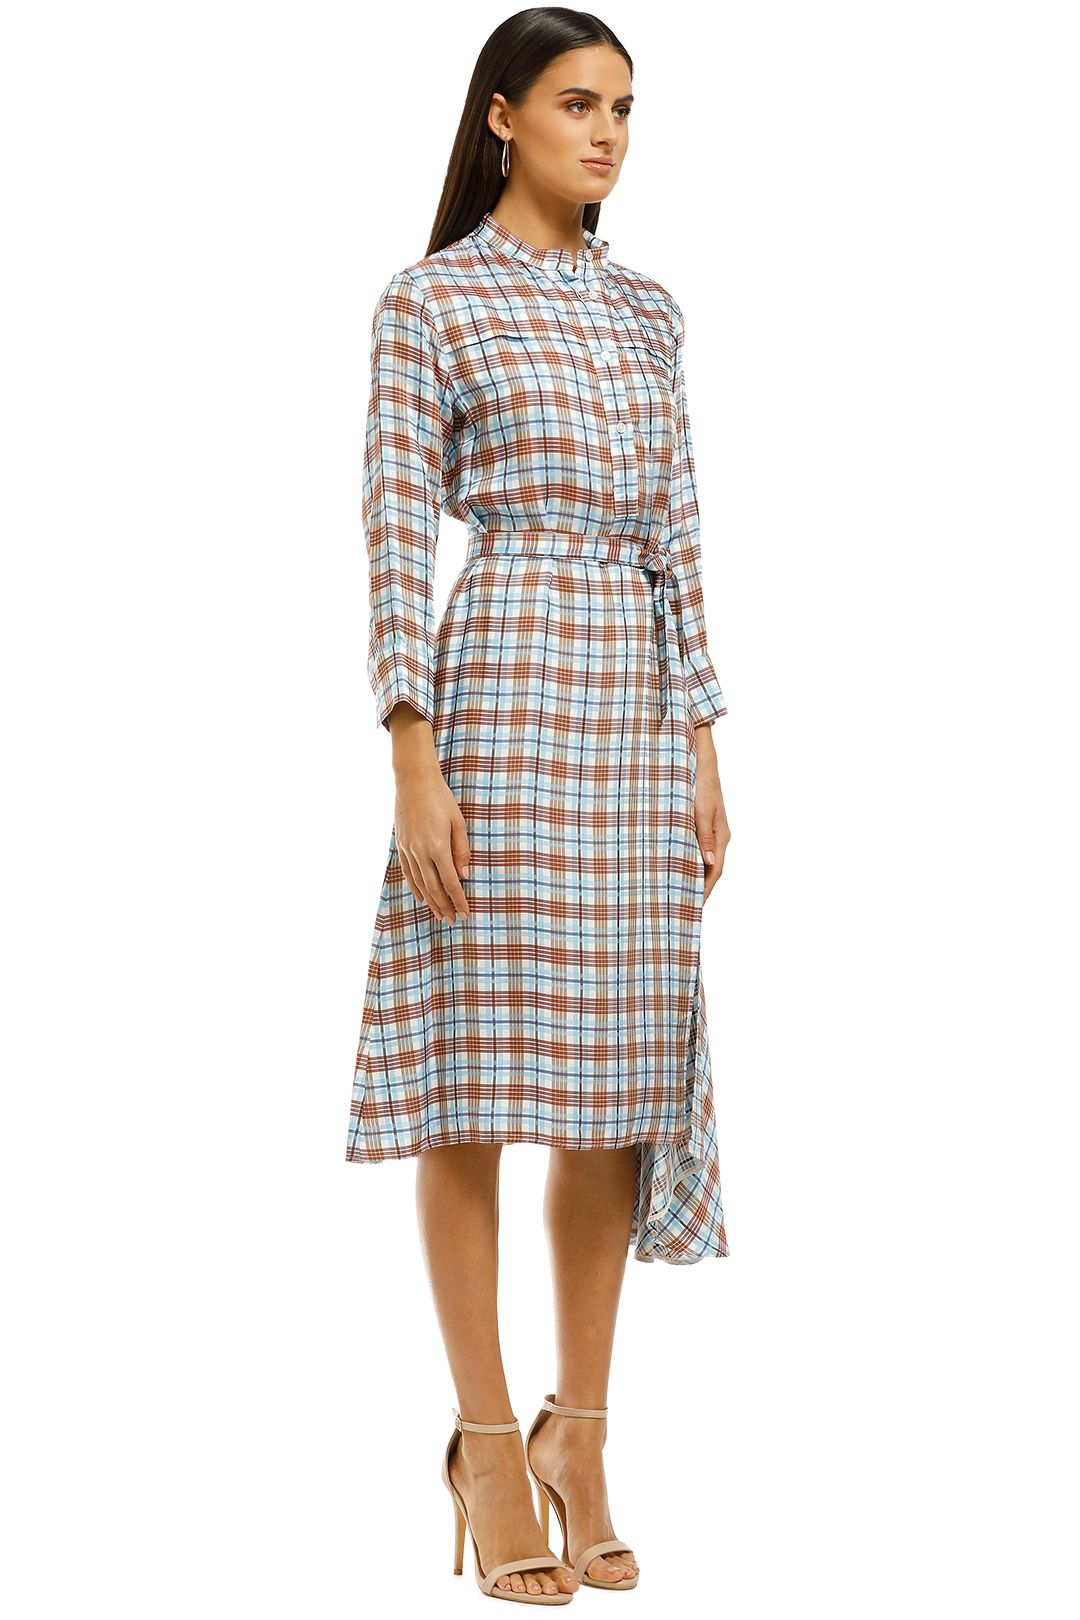 Scanlan Theodore - Check Shirt Dress - Multi - Side